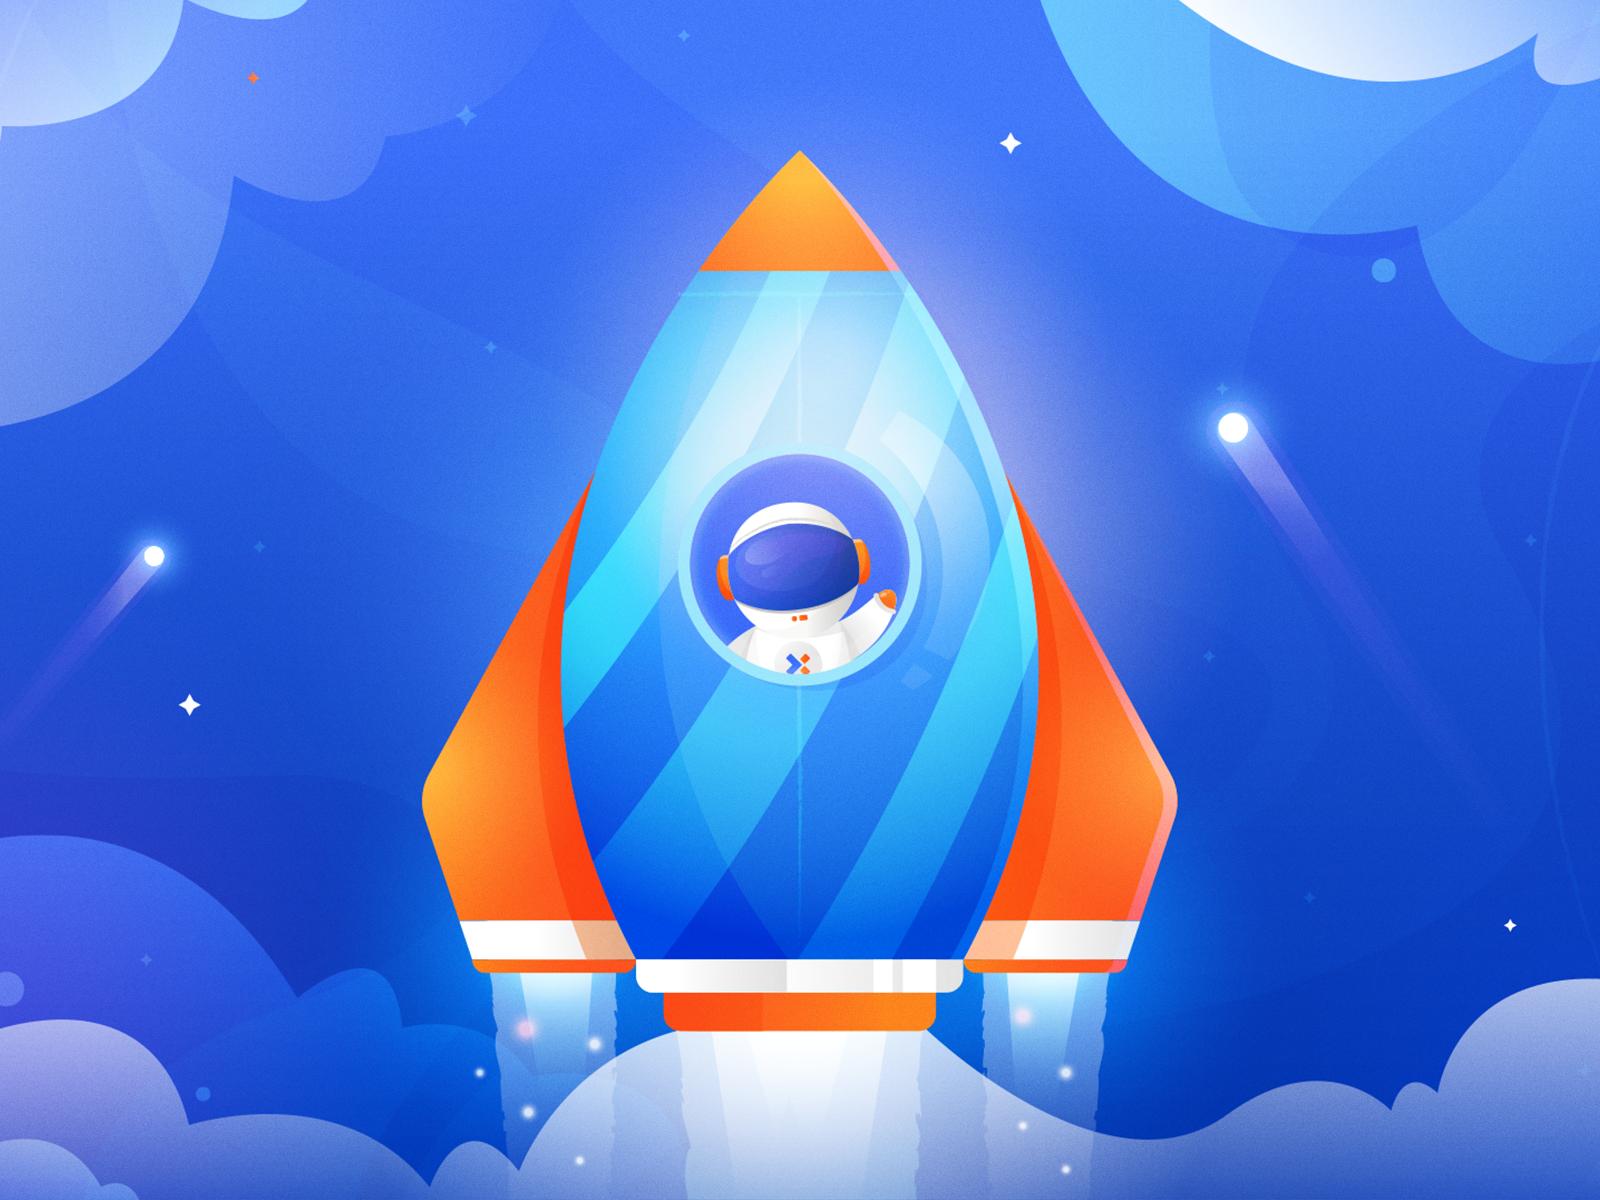 Astronaut spaceship rocket character galaxy planet glow space astronaut ux ui illustration vector